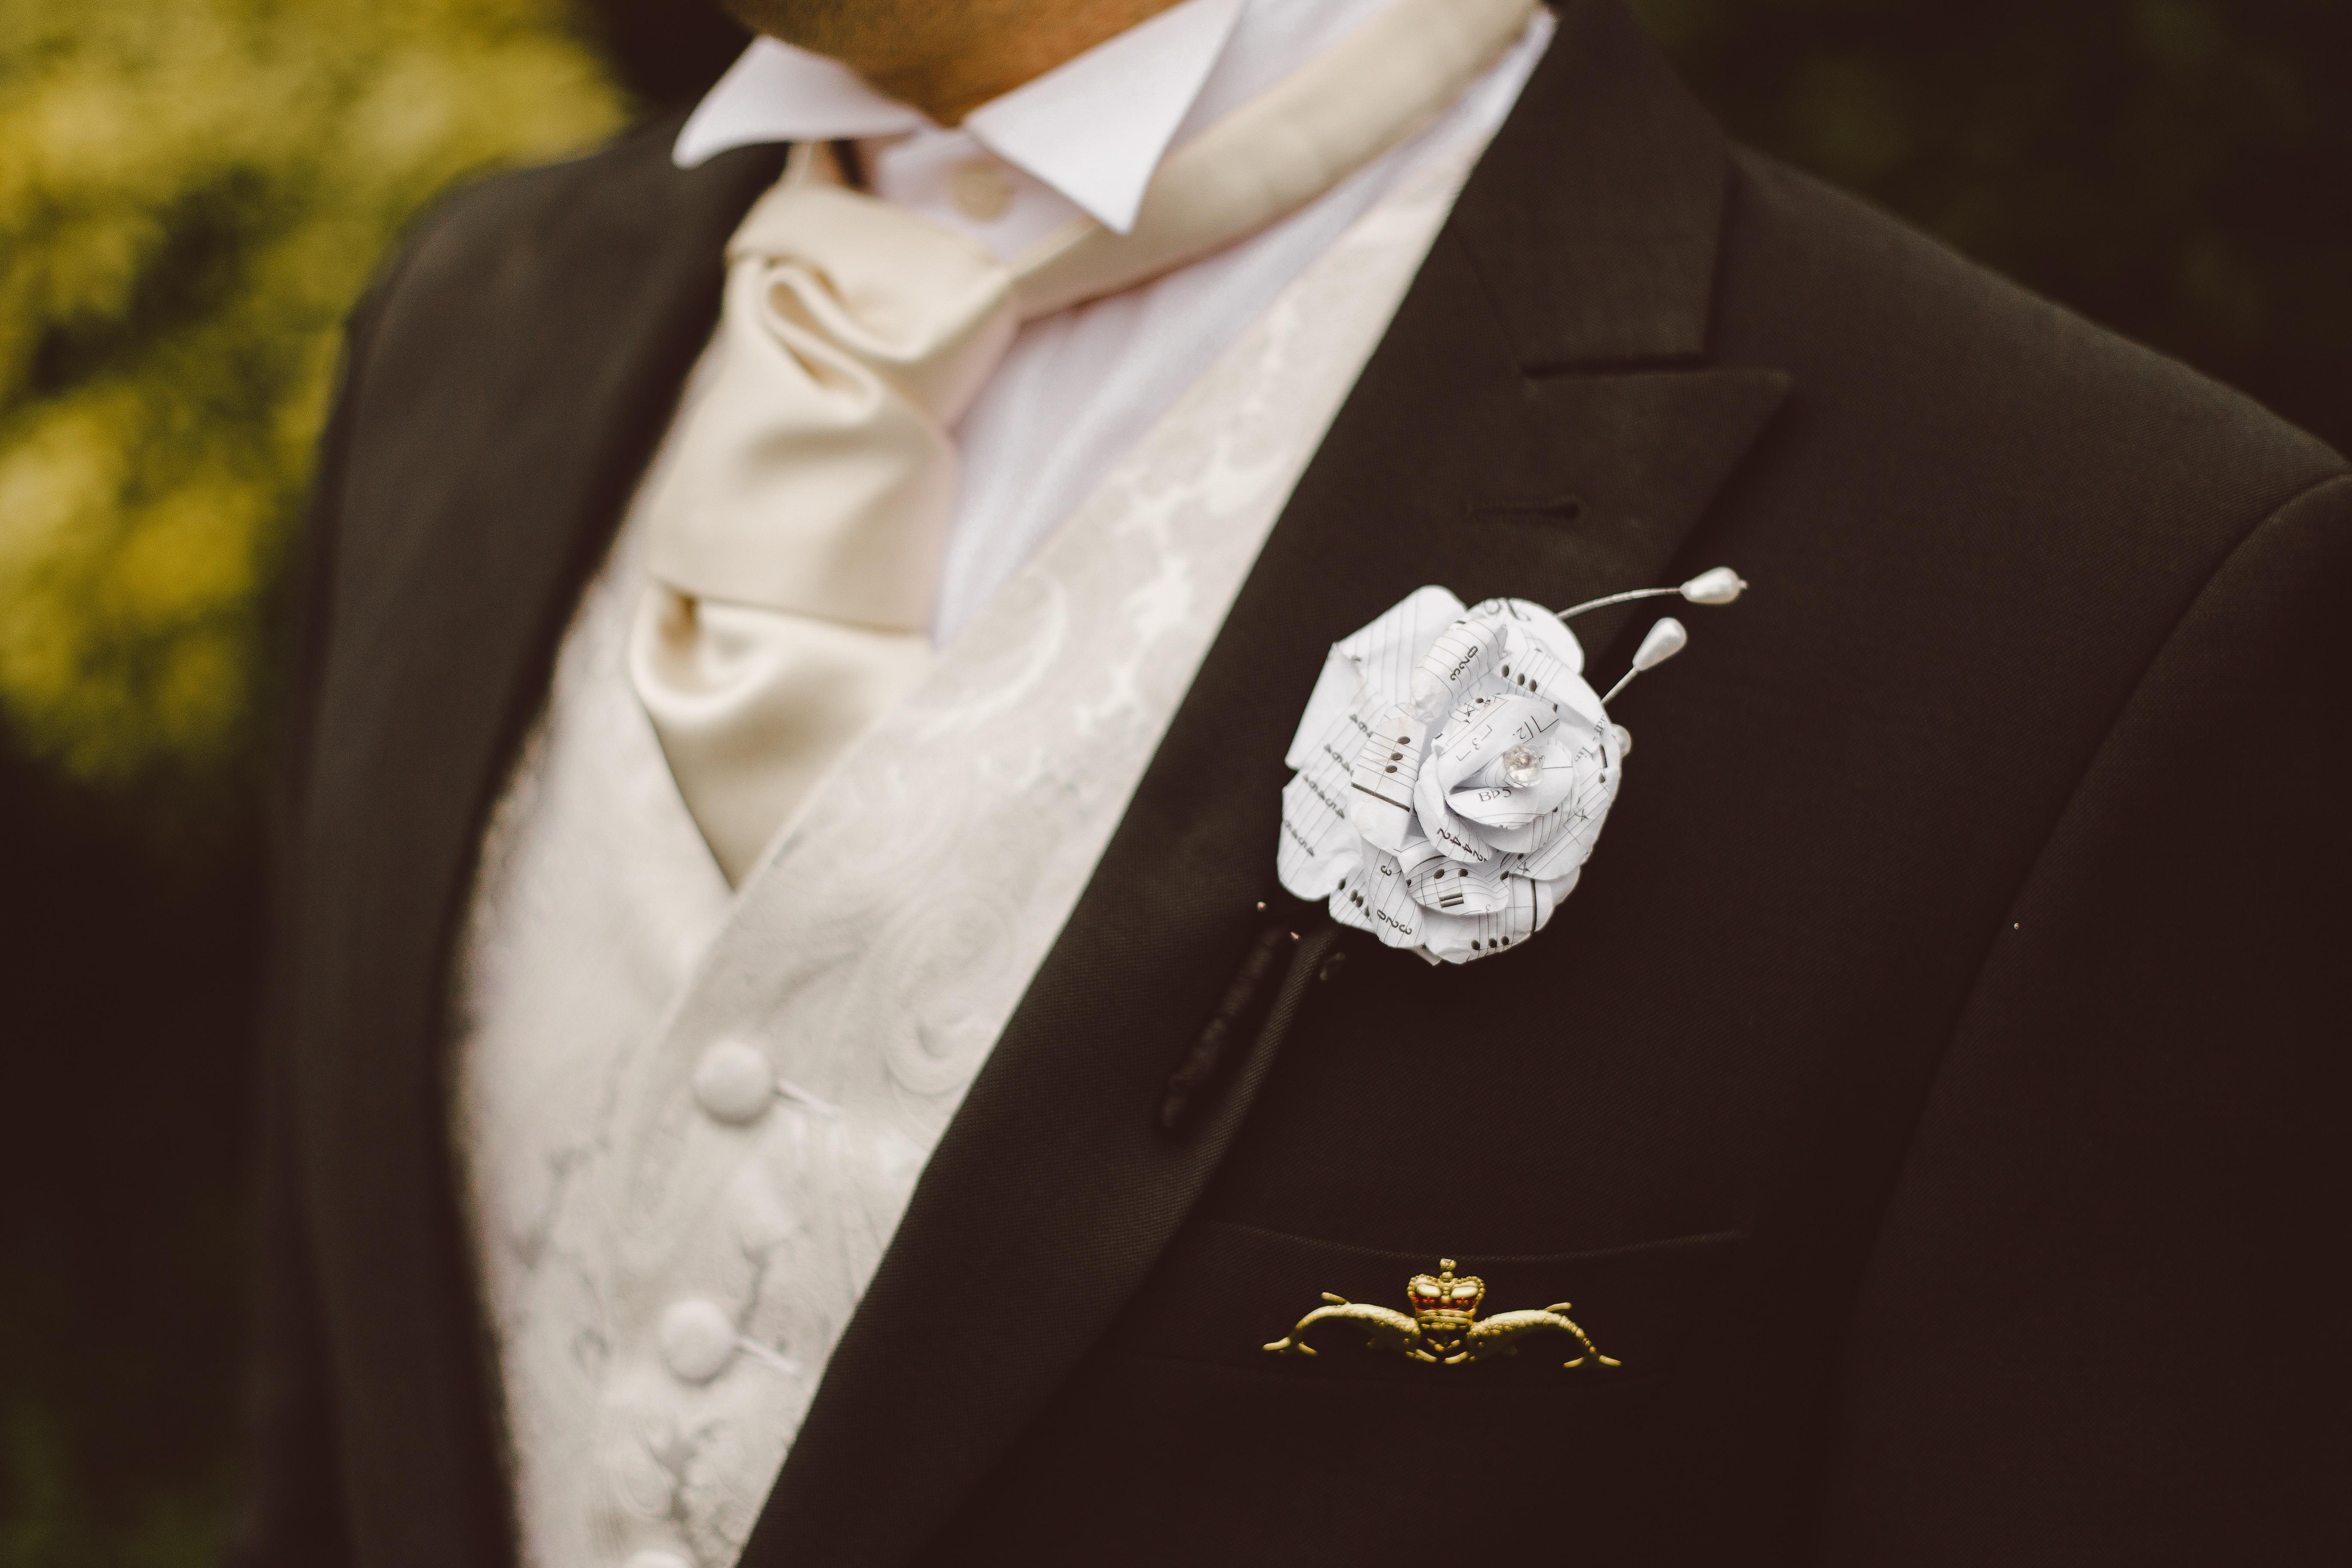 person wearing peaked lapel suit jacket